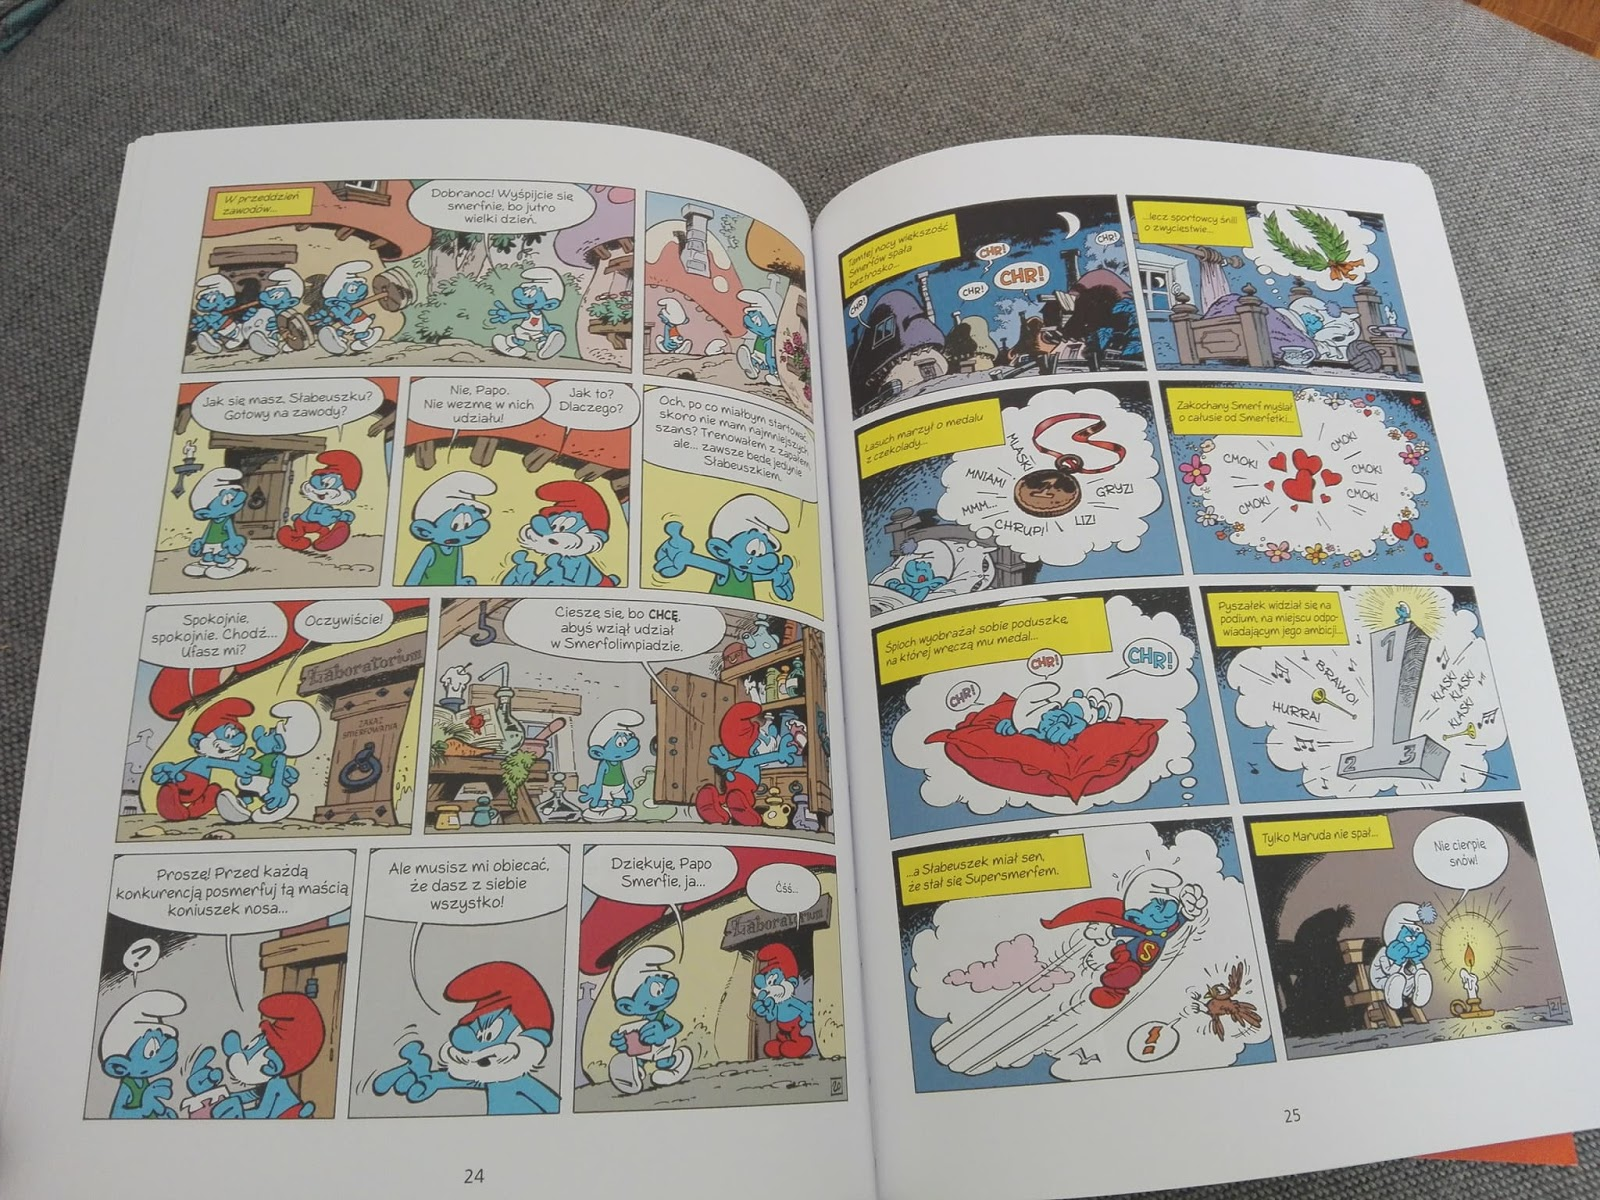 komiks o smerfach